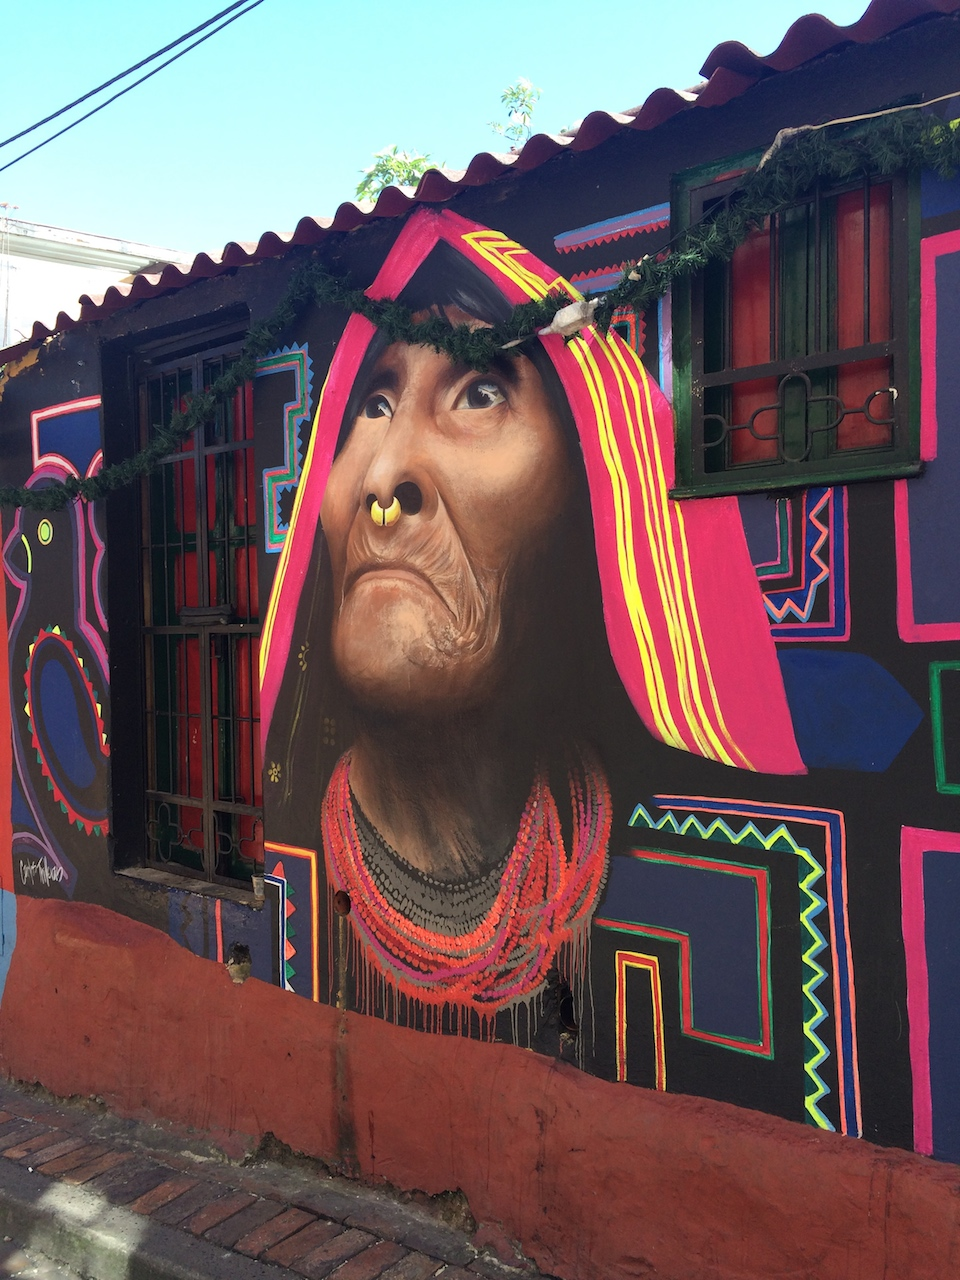 Street Art at Chorro de Quevedo in Bogotá, Colombia